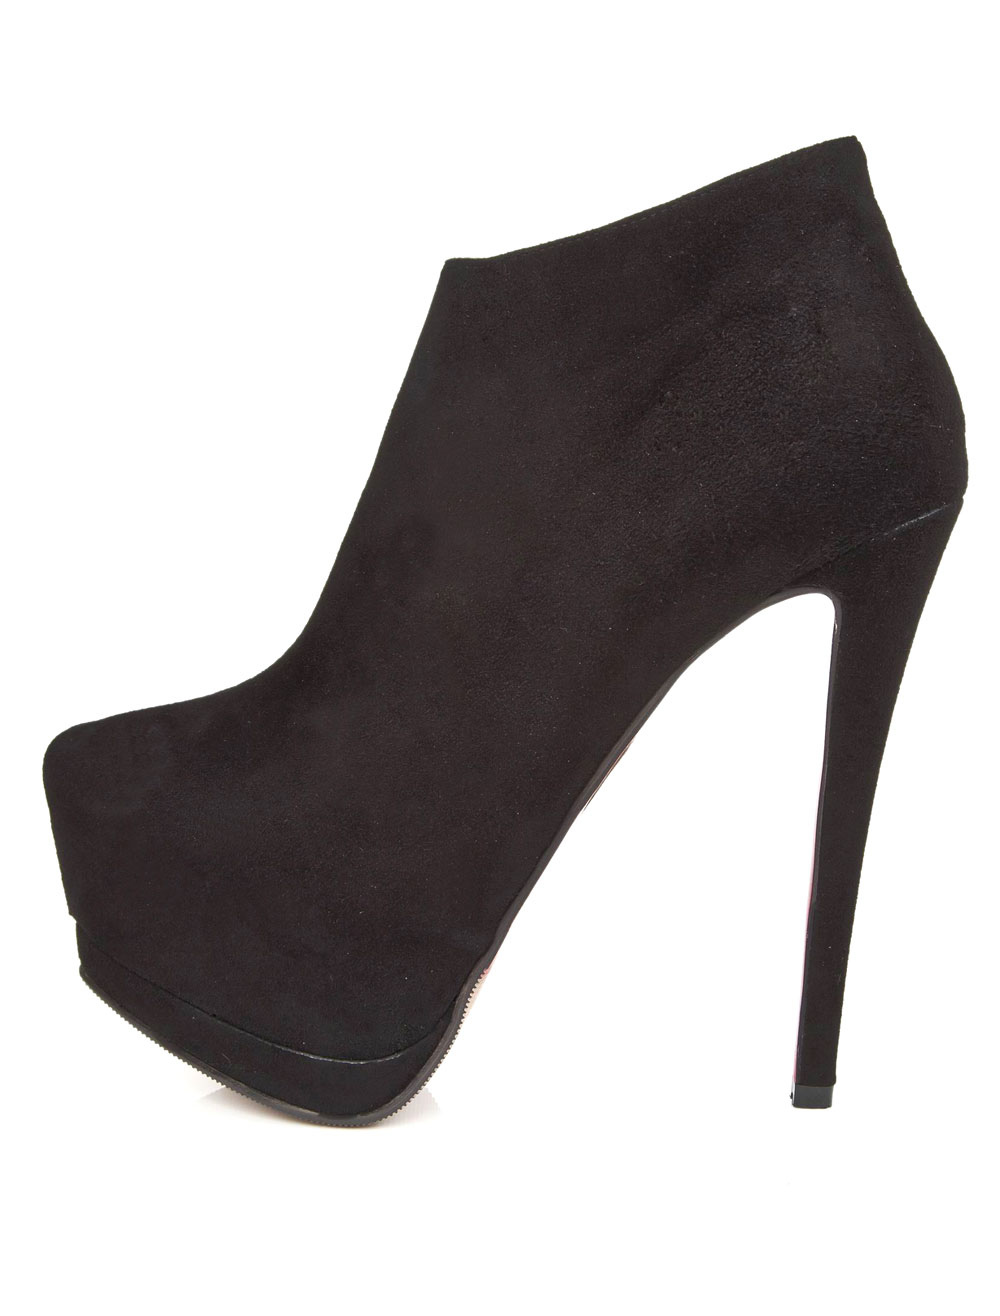 Black Almond Toe Stiletto Heel High-cut Booties